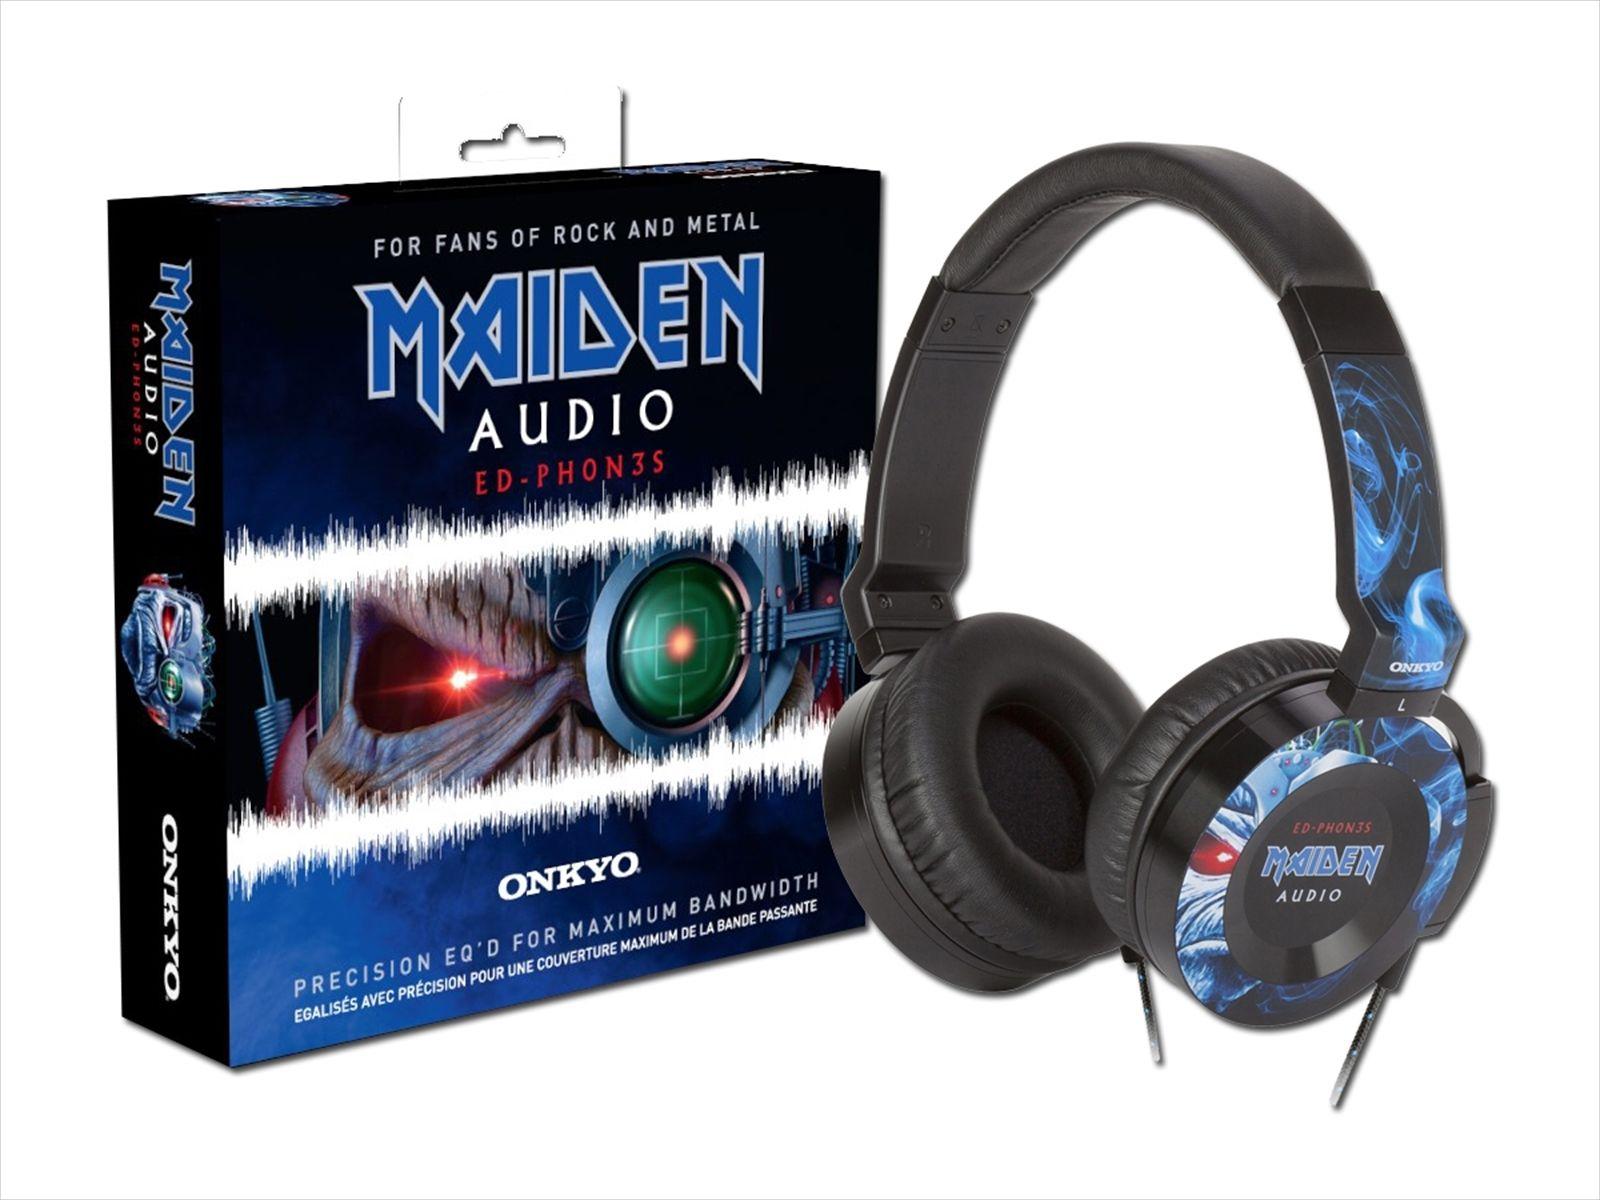 Maiden Audio By Onkyo Edph0N3S Headphones (Iron Maiden) for £49.99 at HMV